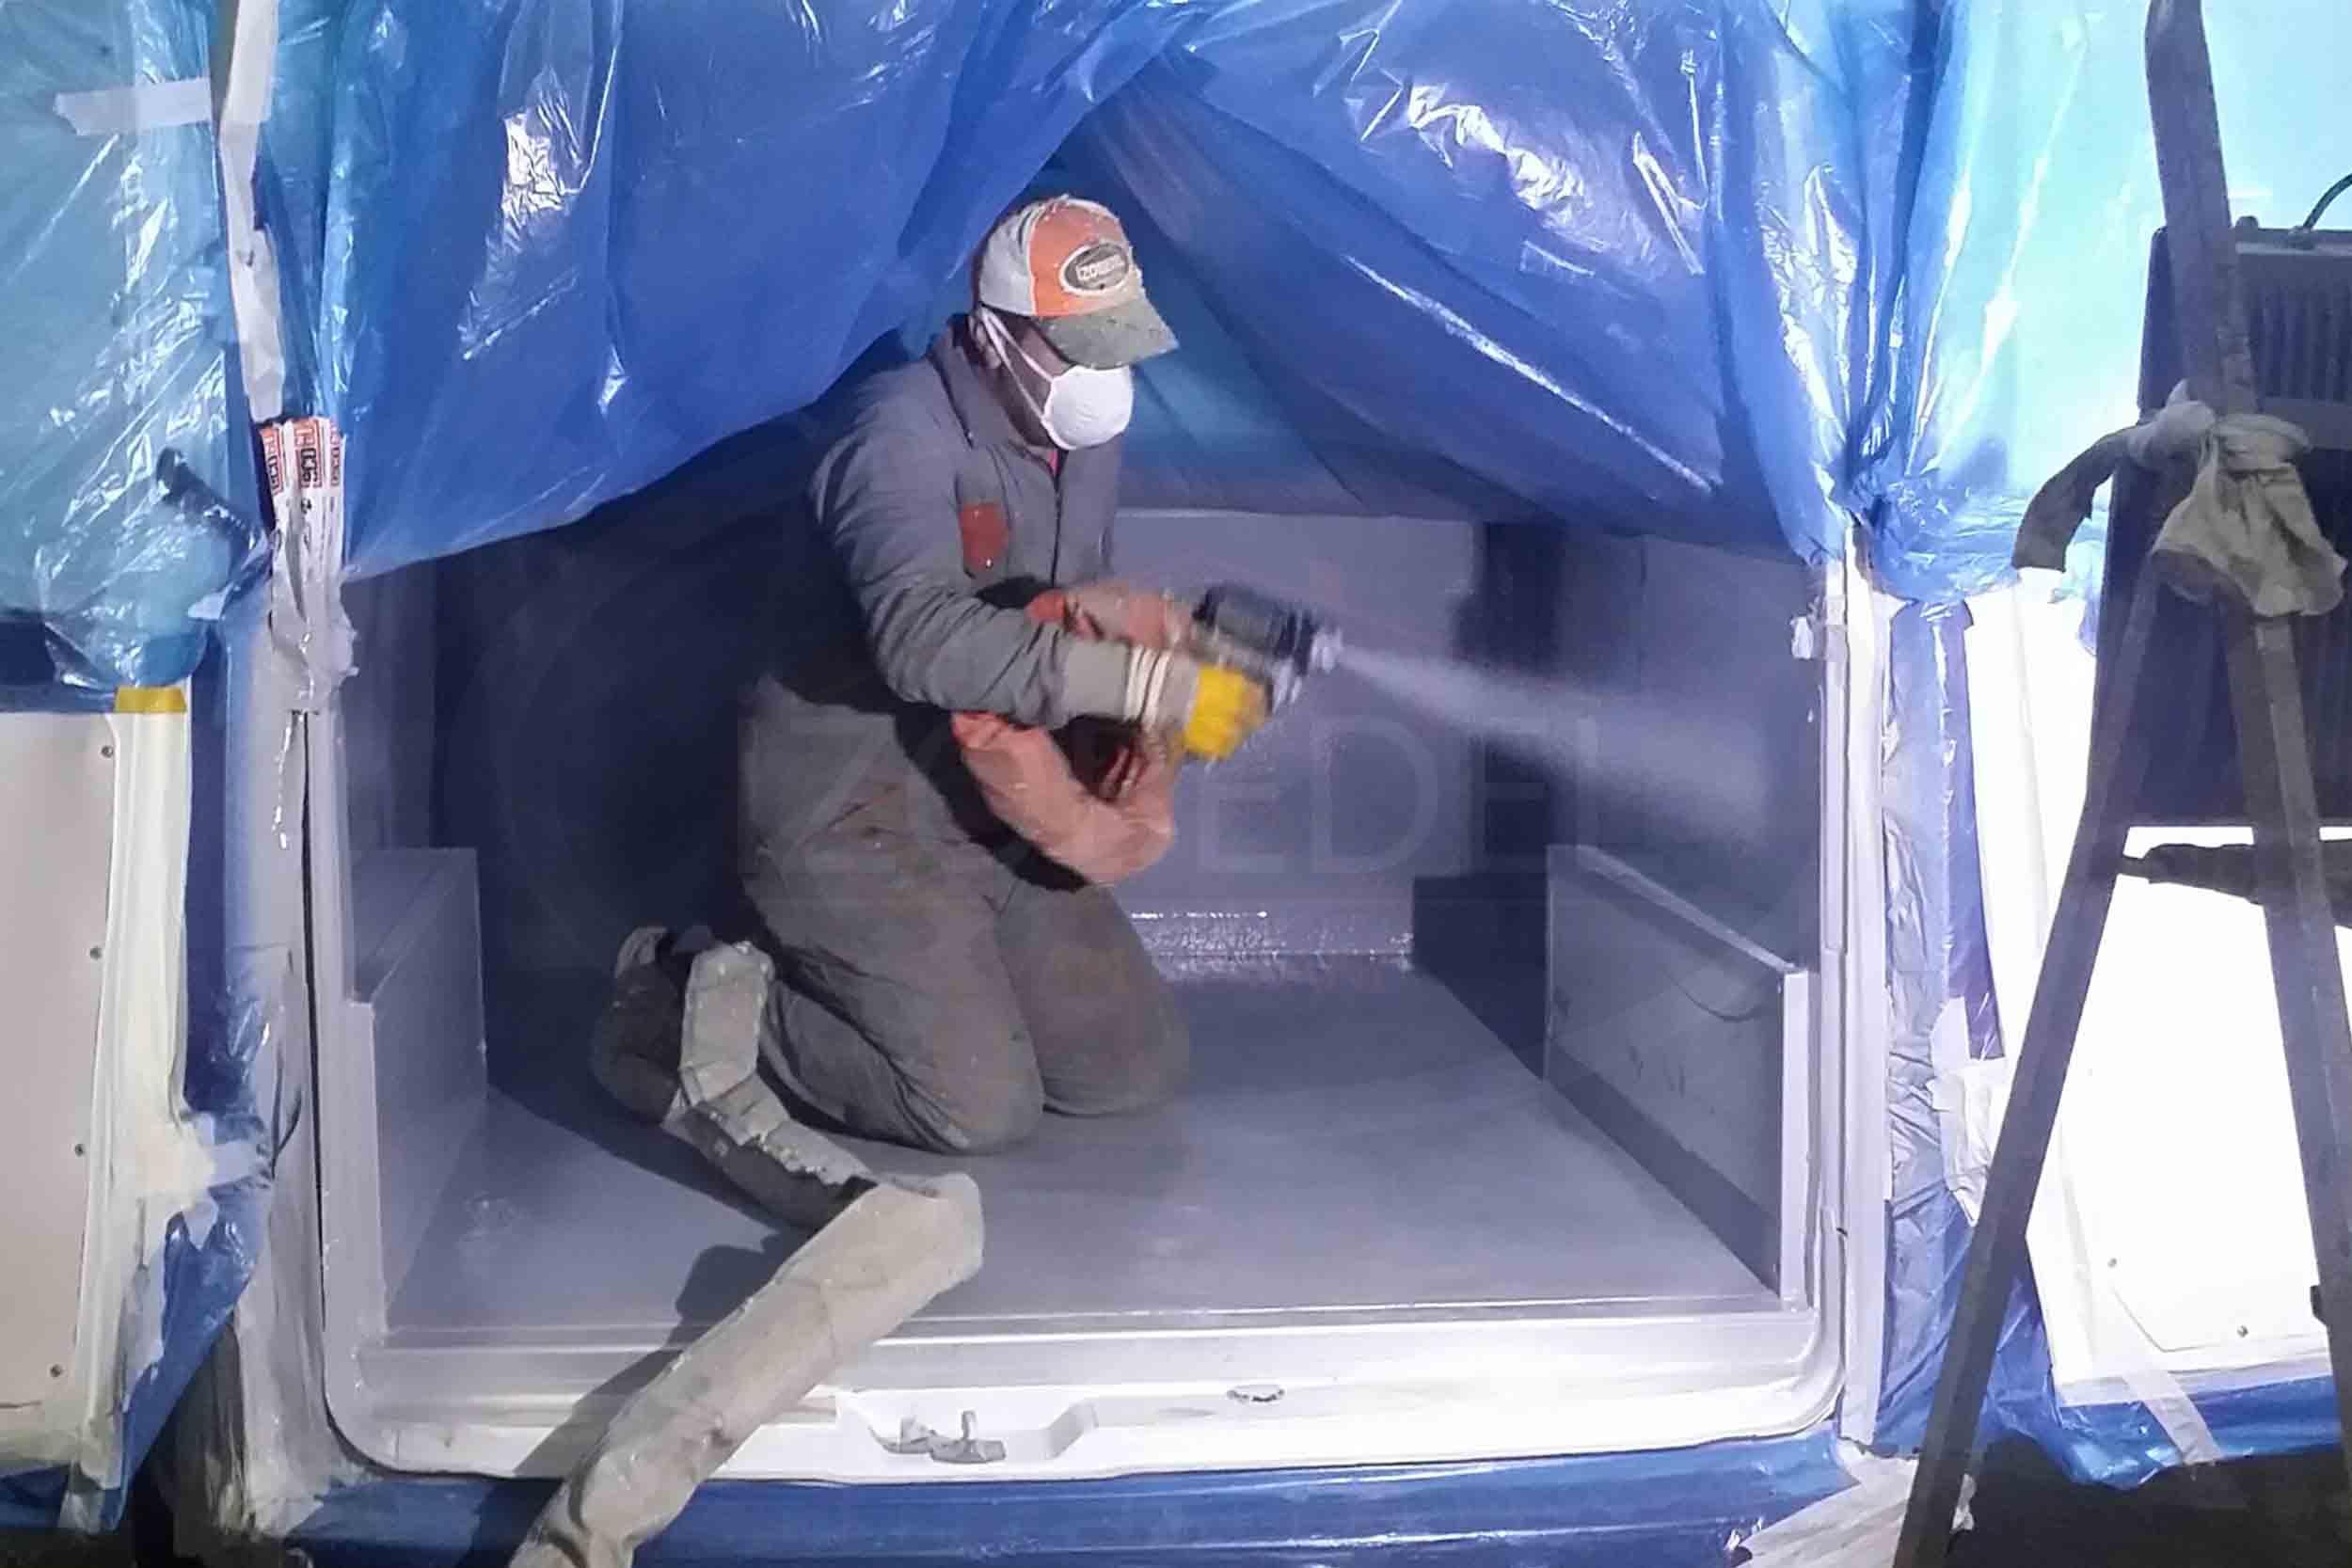 sprey-polyurea-araç-kasa-kaplama13